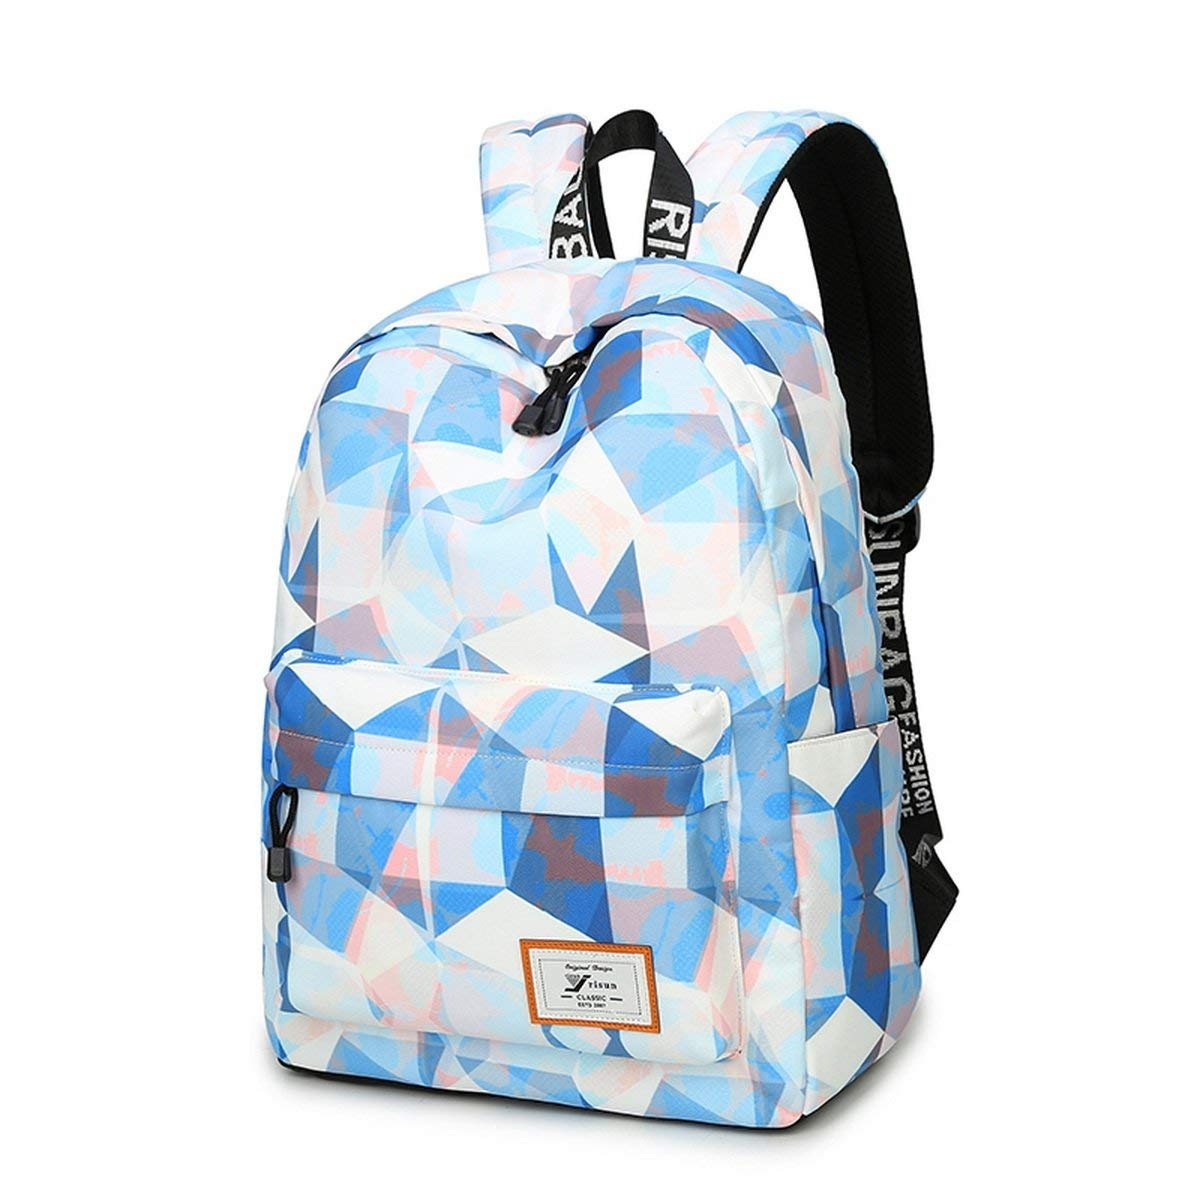 e982b8b9784c Joymoze Fashion Leisure Backpack for Girls Teenage School Backpack Women  Print Backpack Purse Blue and White